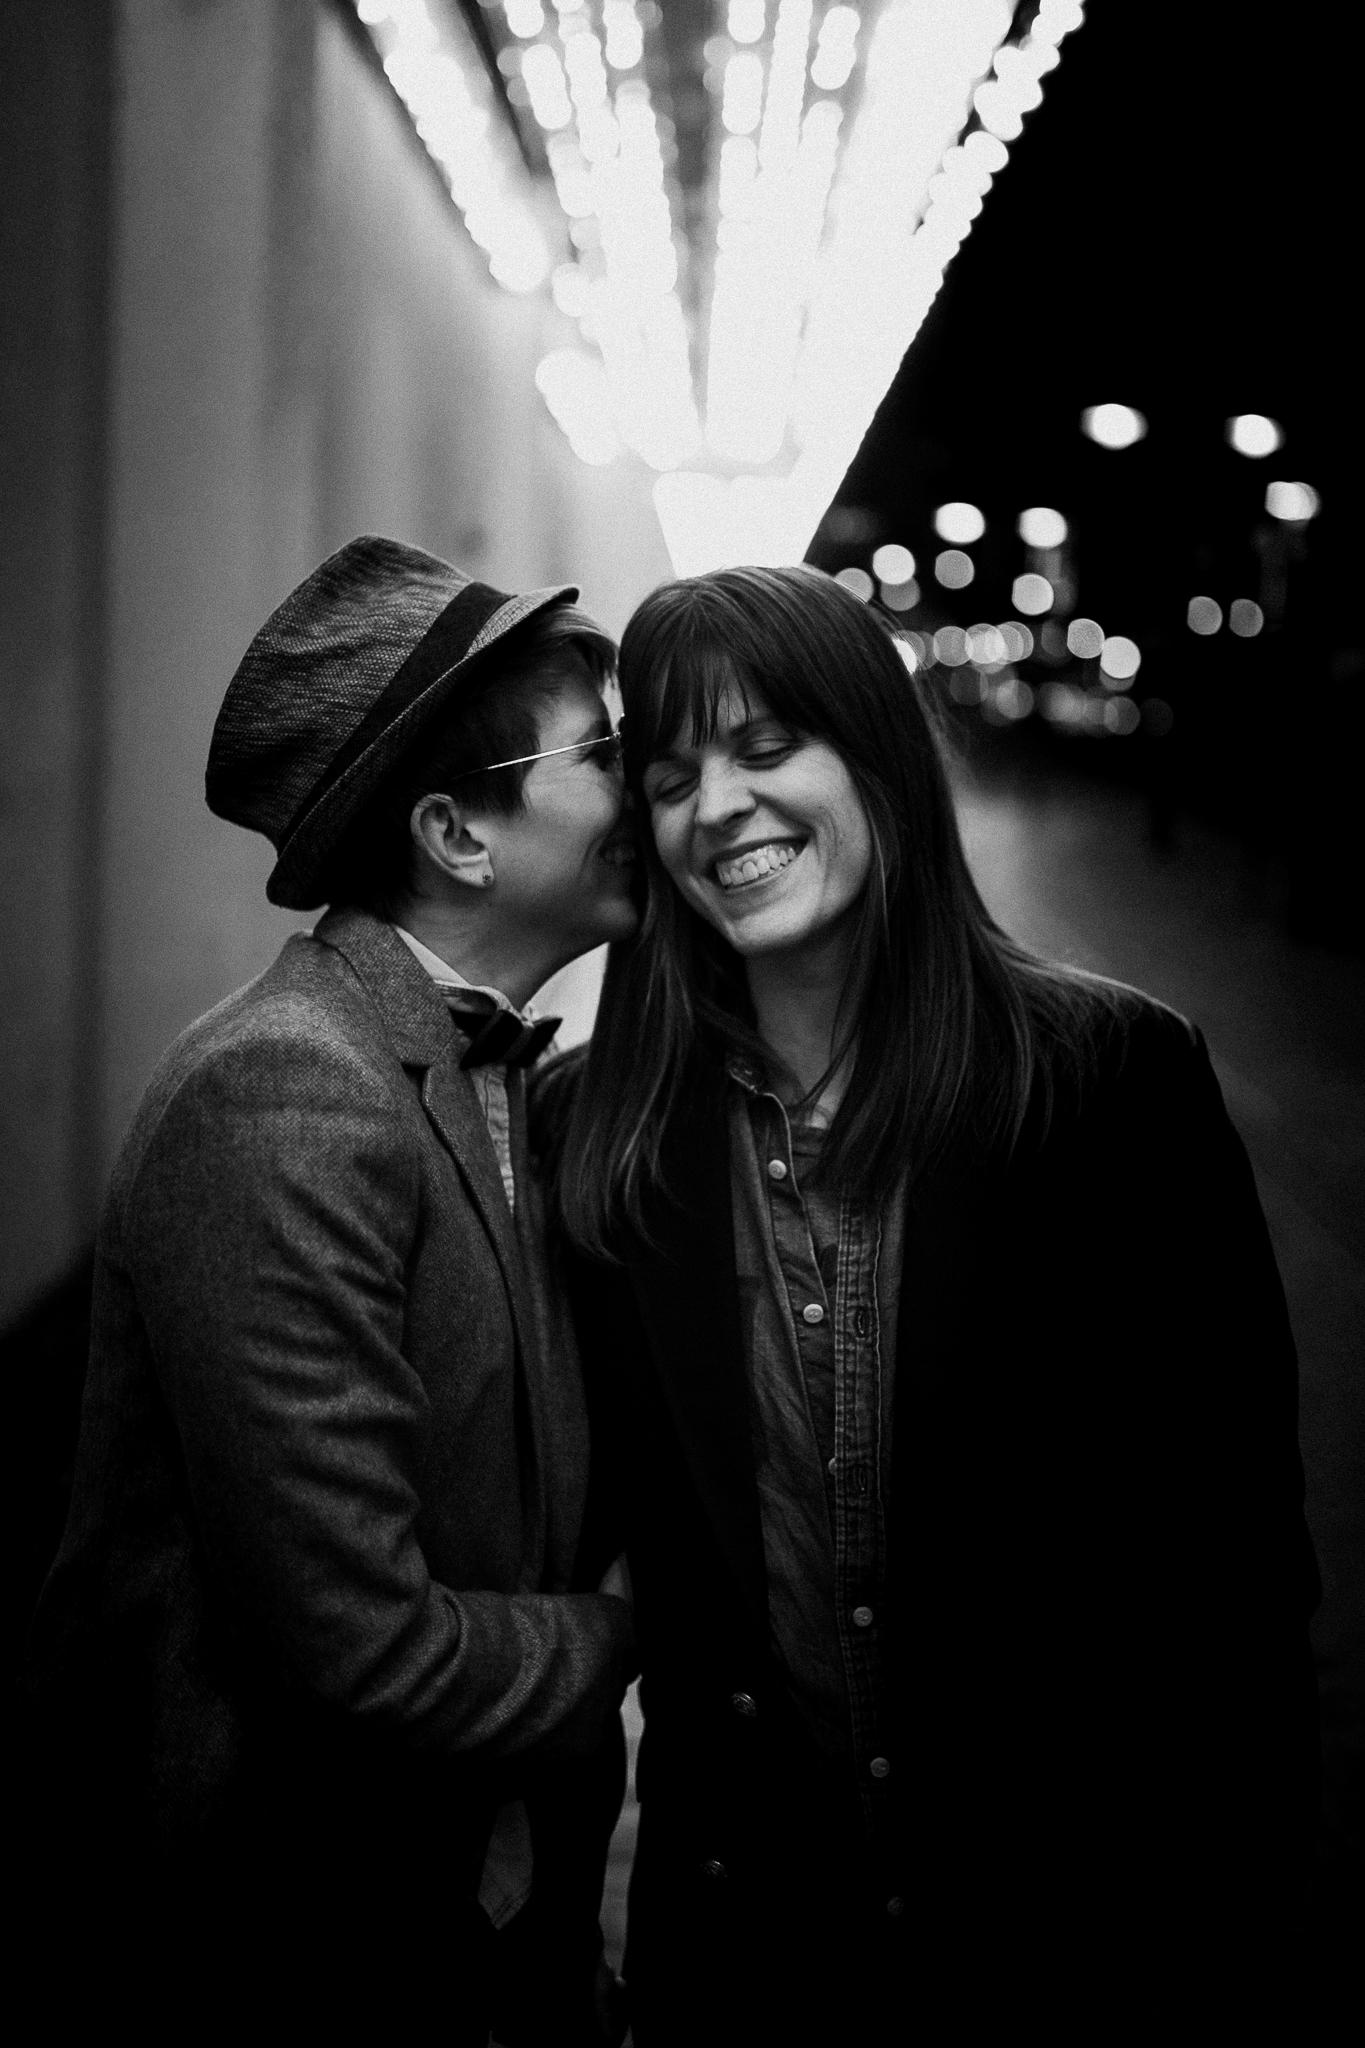 Archer Inspired Photography Hilary and Gia LGTBQ Reno Nevada Couple Wedding Engagement Photographer-15.jpg